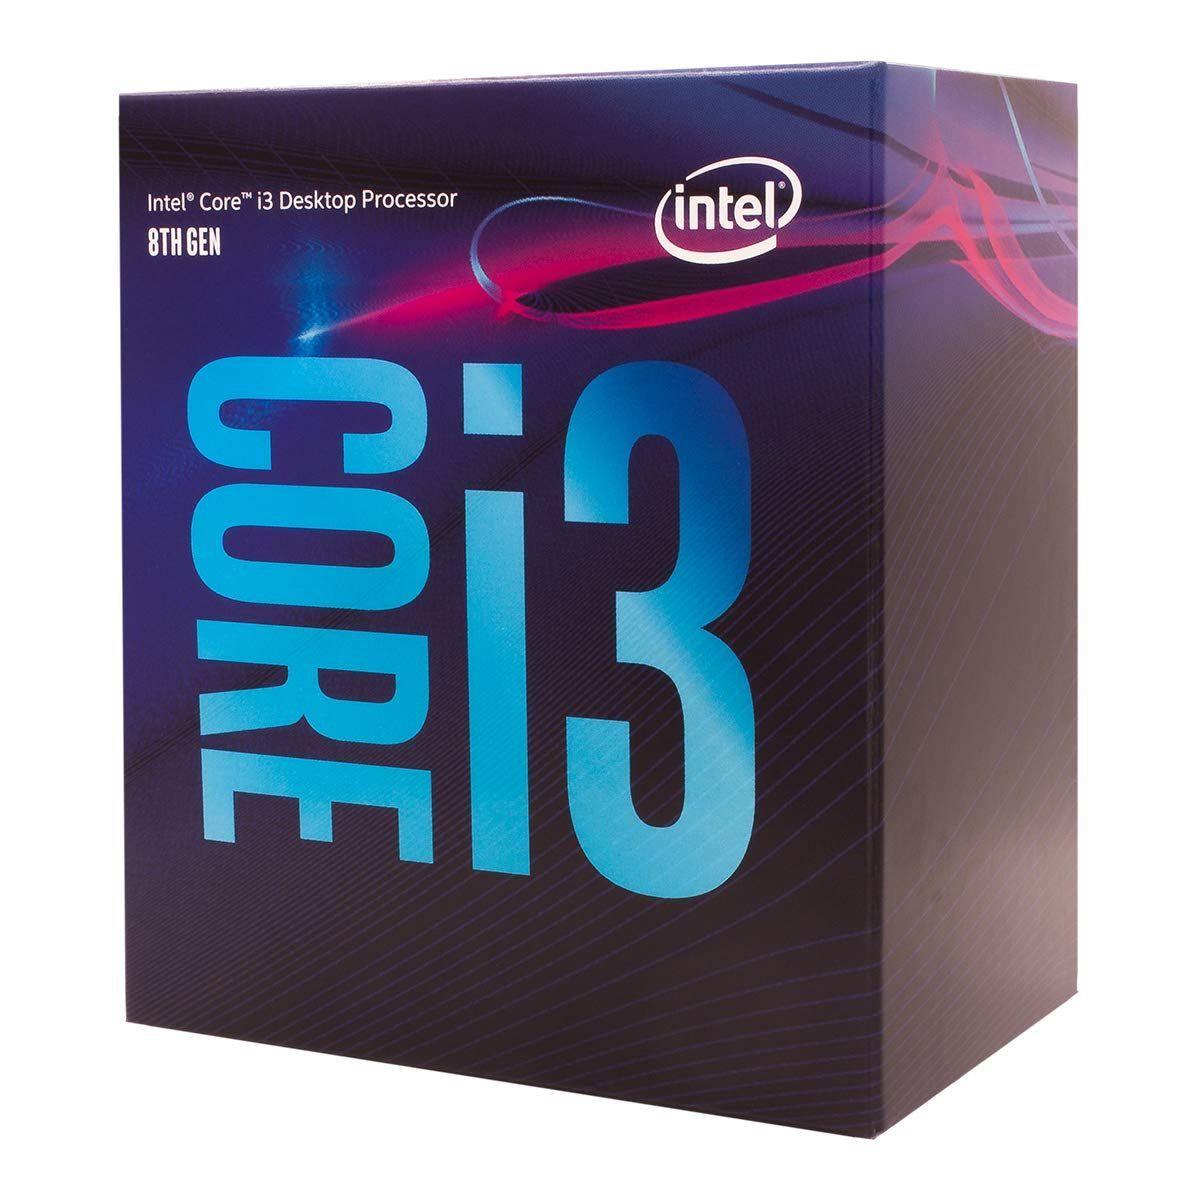 Intel Core I3 8100 Desktop Processor 4 Cores Up To 3 6 Ghz Turbo Unlocked Lga1151 300 Series 95w Intel Core Intel Processor